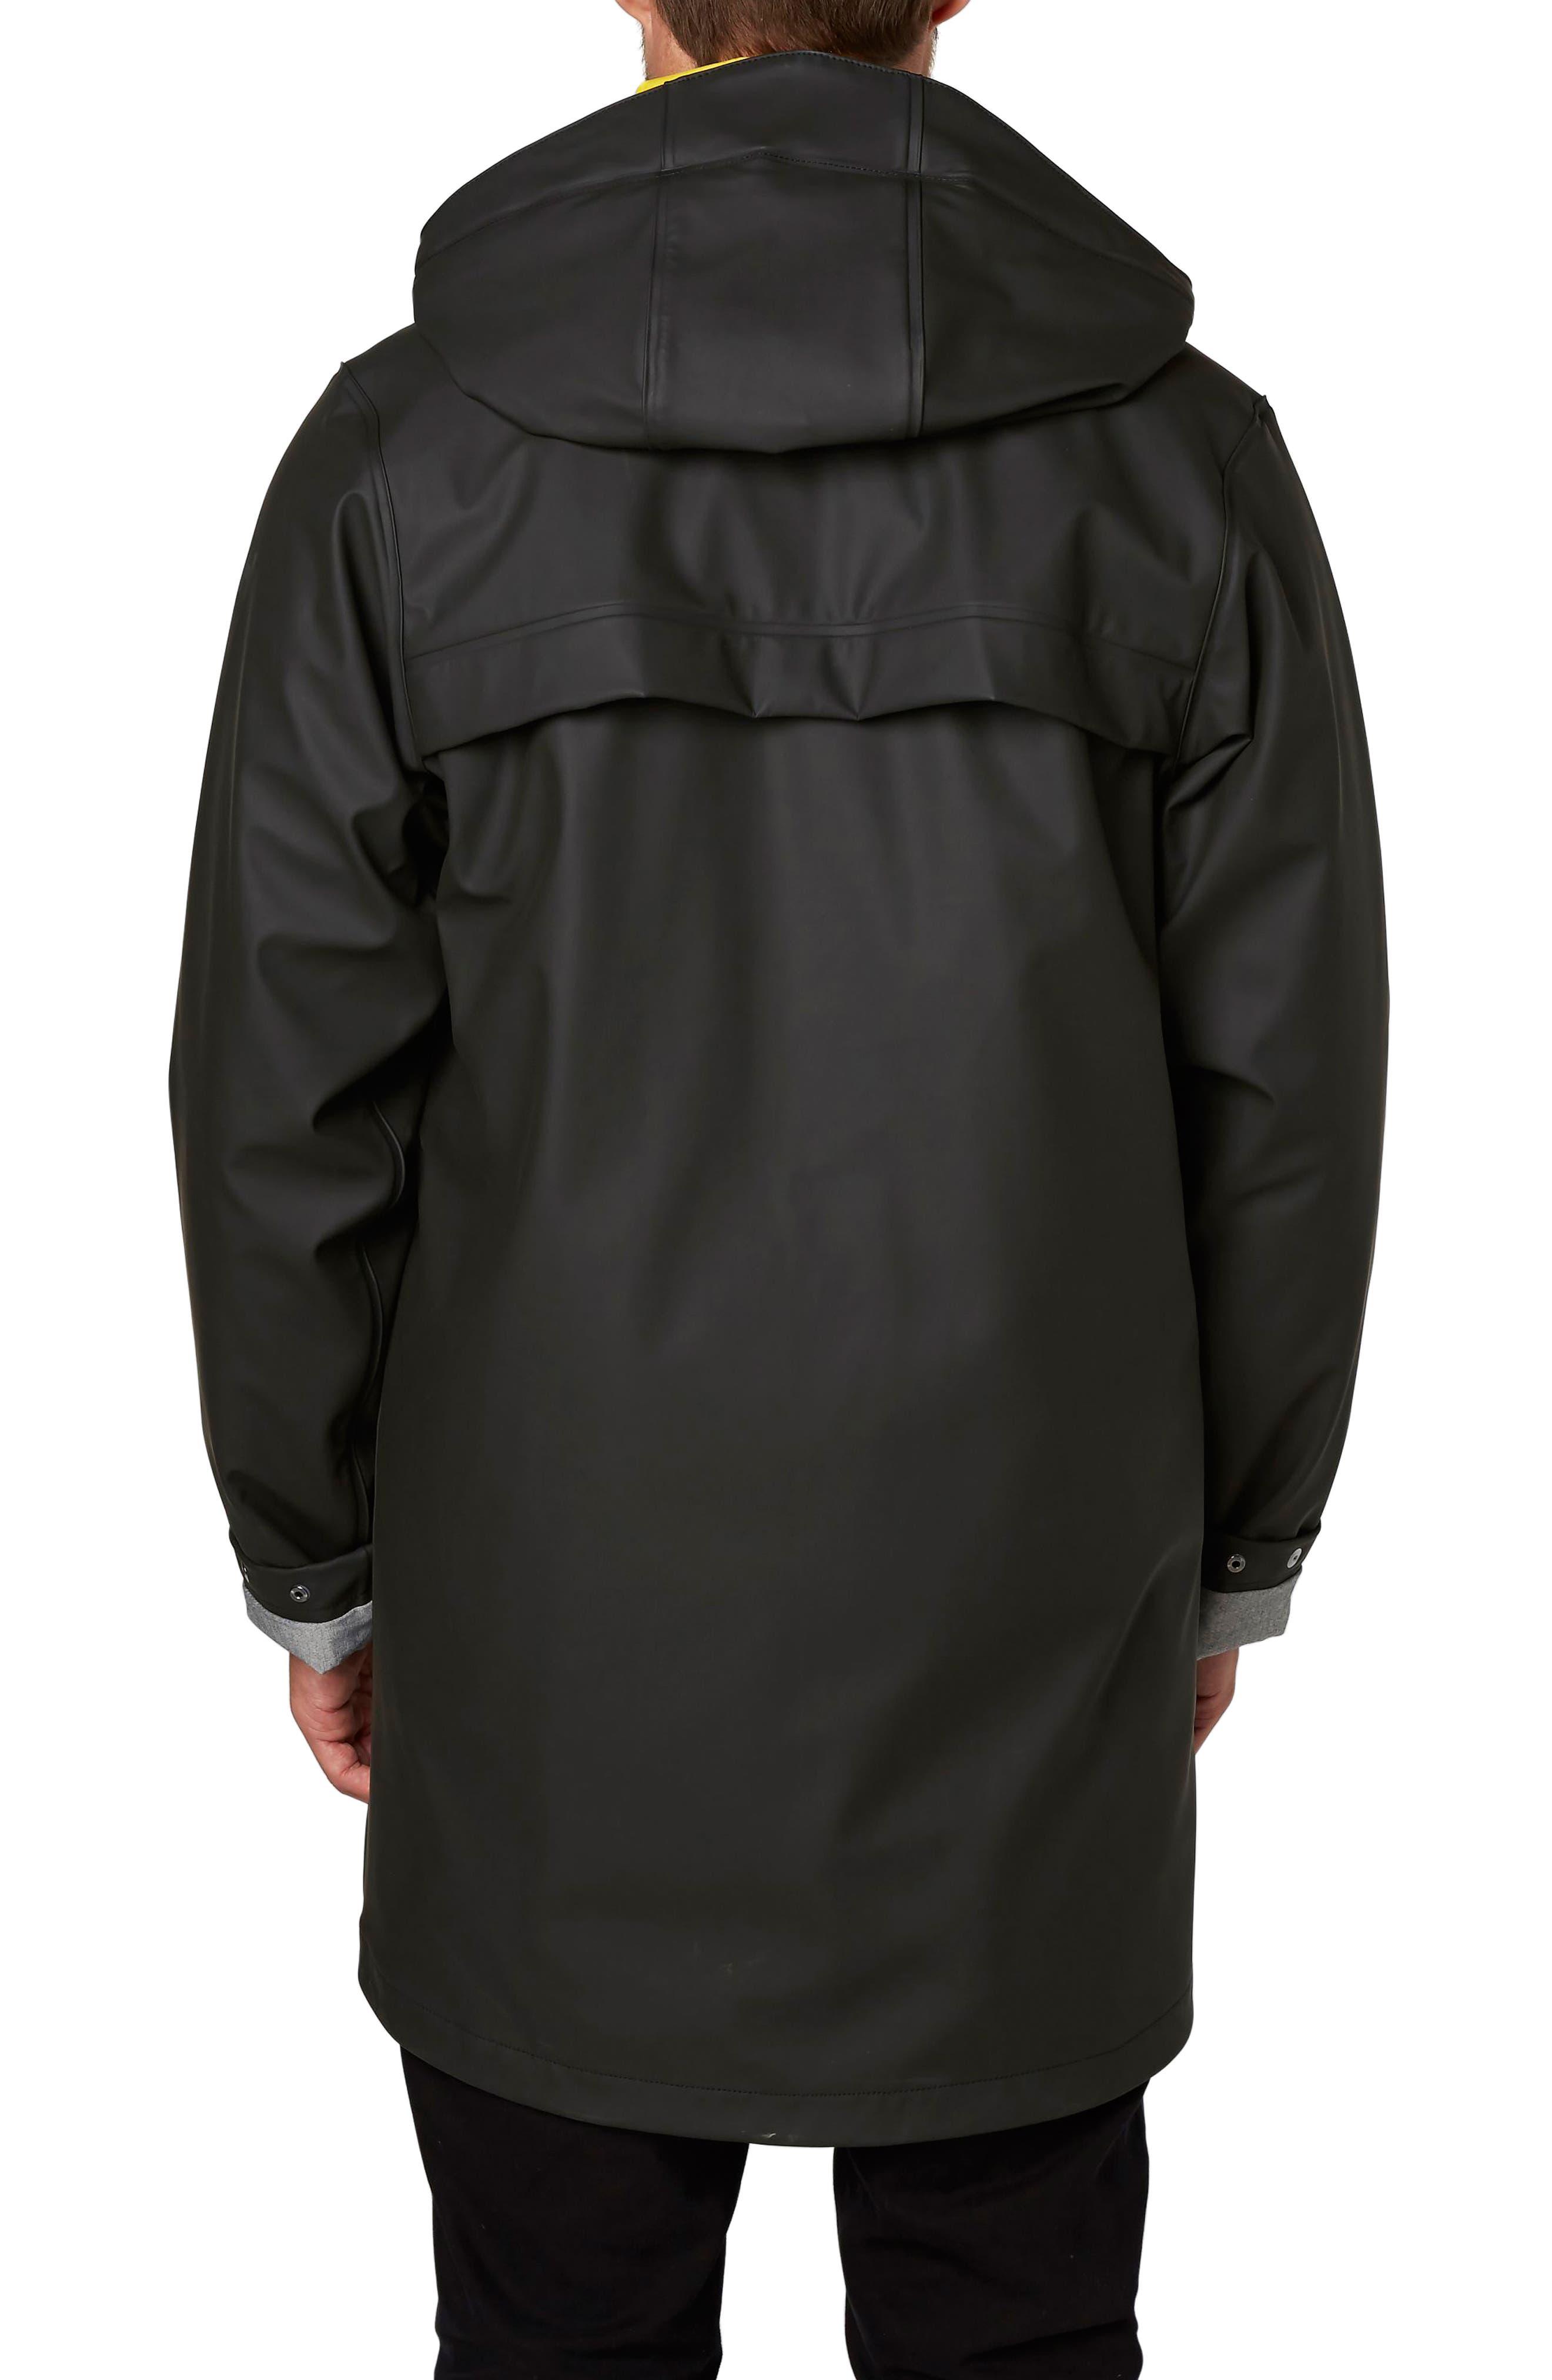 Copenhagen Raincoat,                             Alternate thumbnail 2, color,                             Black